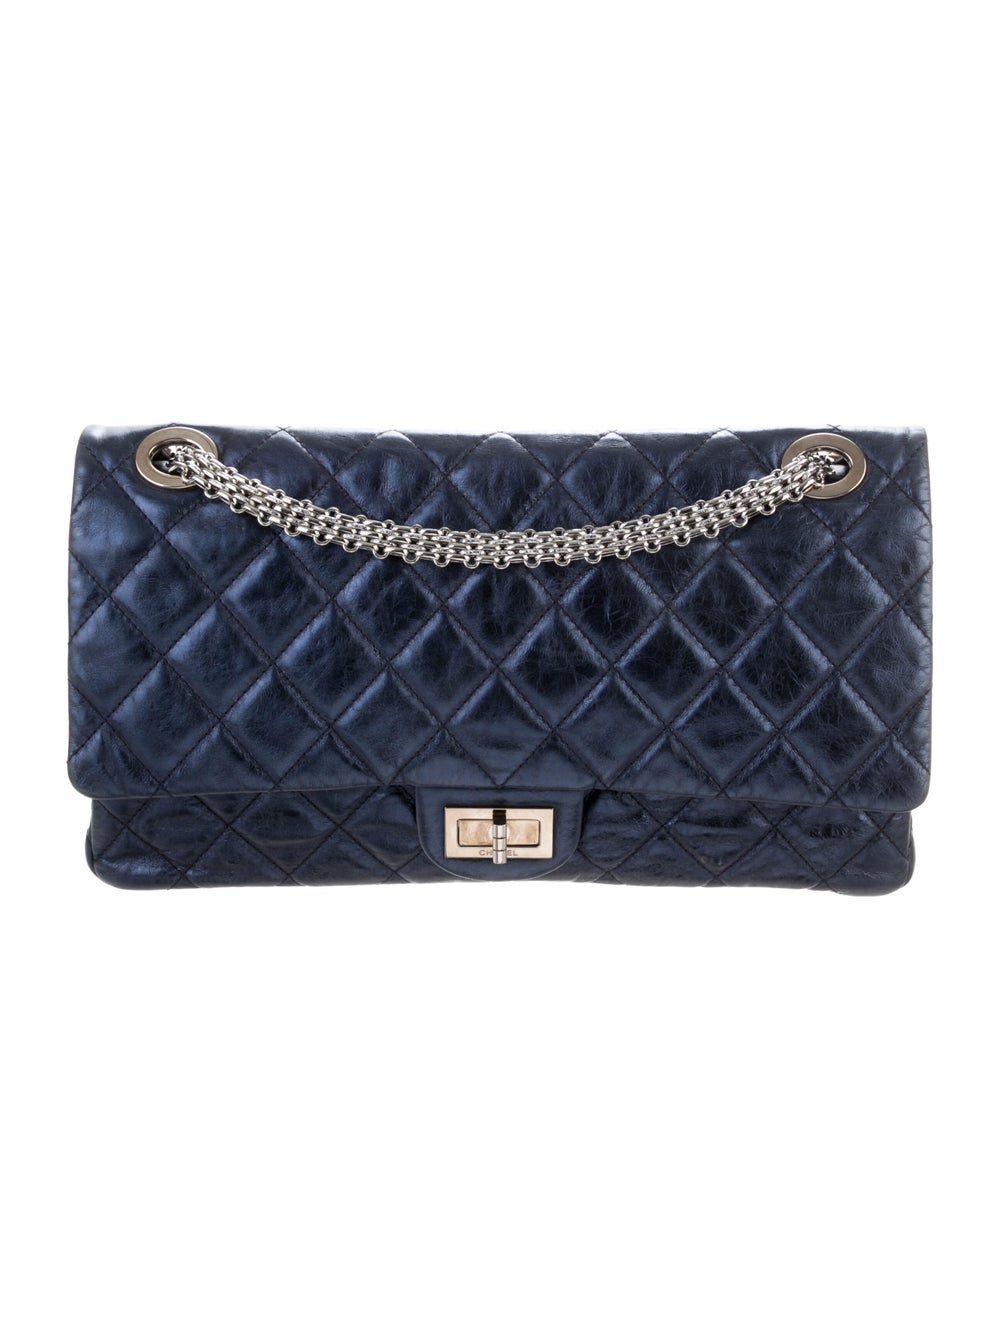 Chanel Reissue 2.55 Classic 227 Flap Bag Blue - image 1